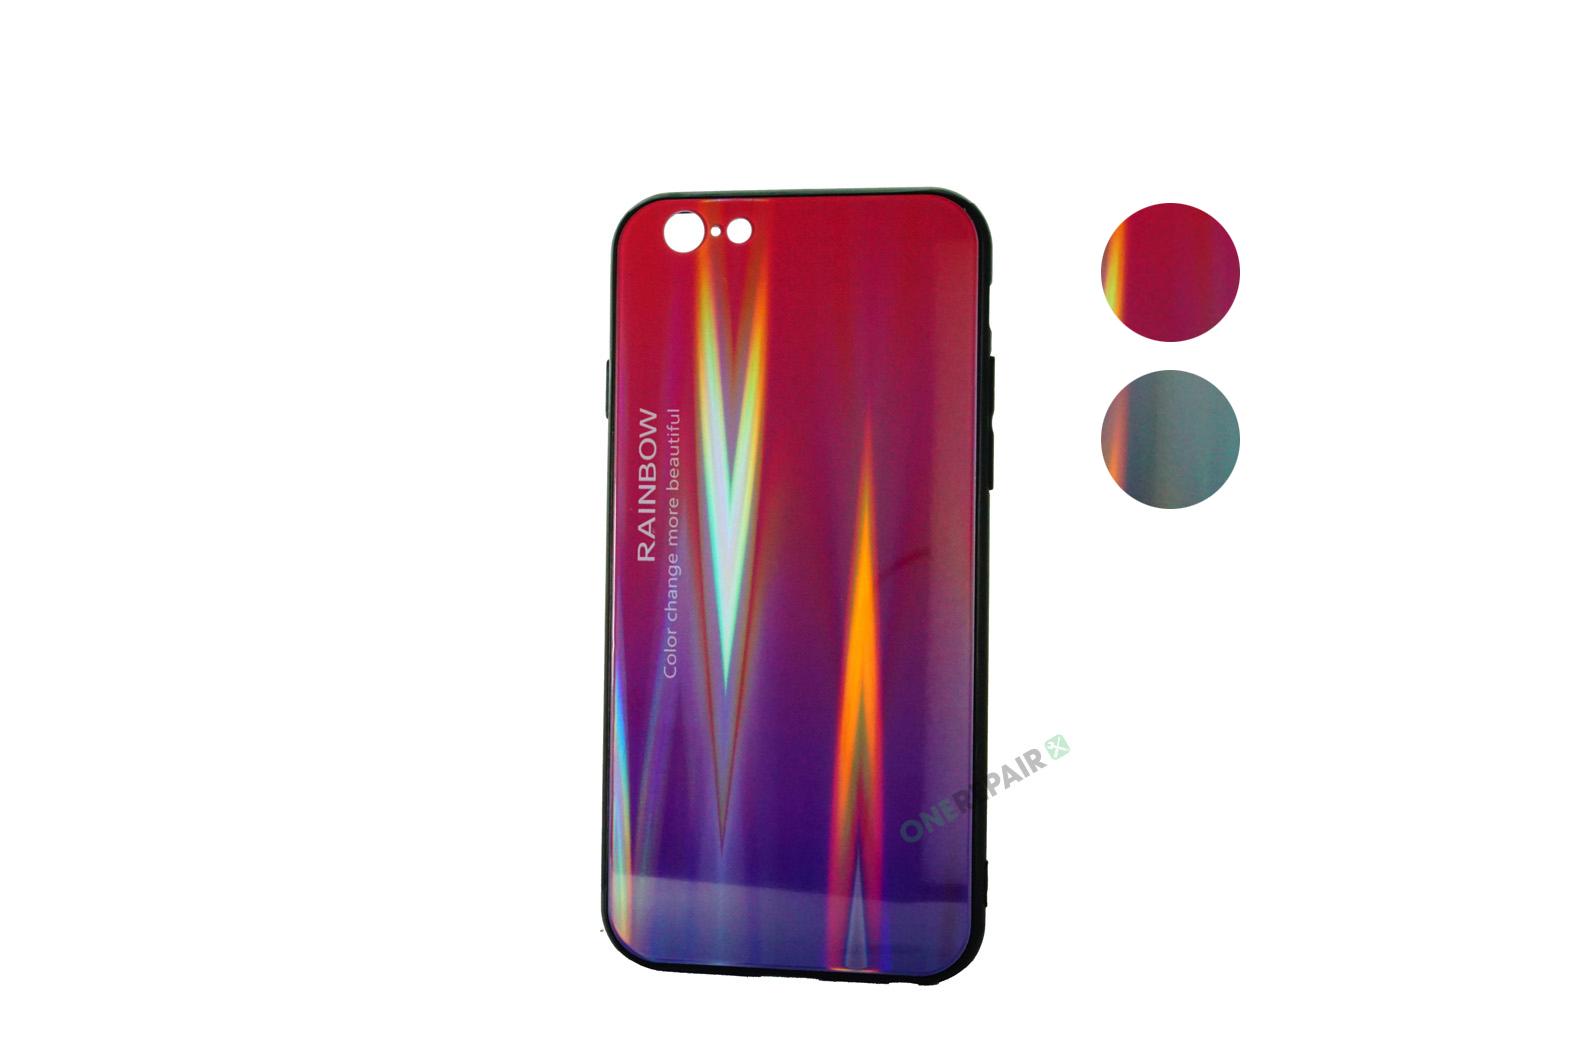 353614-001-002_iPhone_6_6S_Cover_Rainbow_Lilla_Graa_OneRepair_Varianter